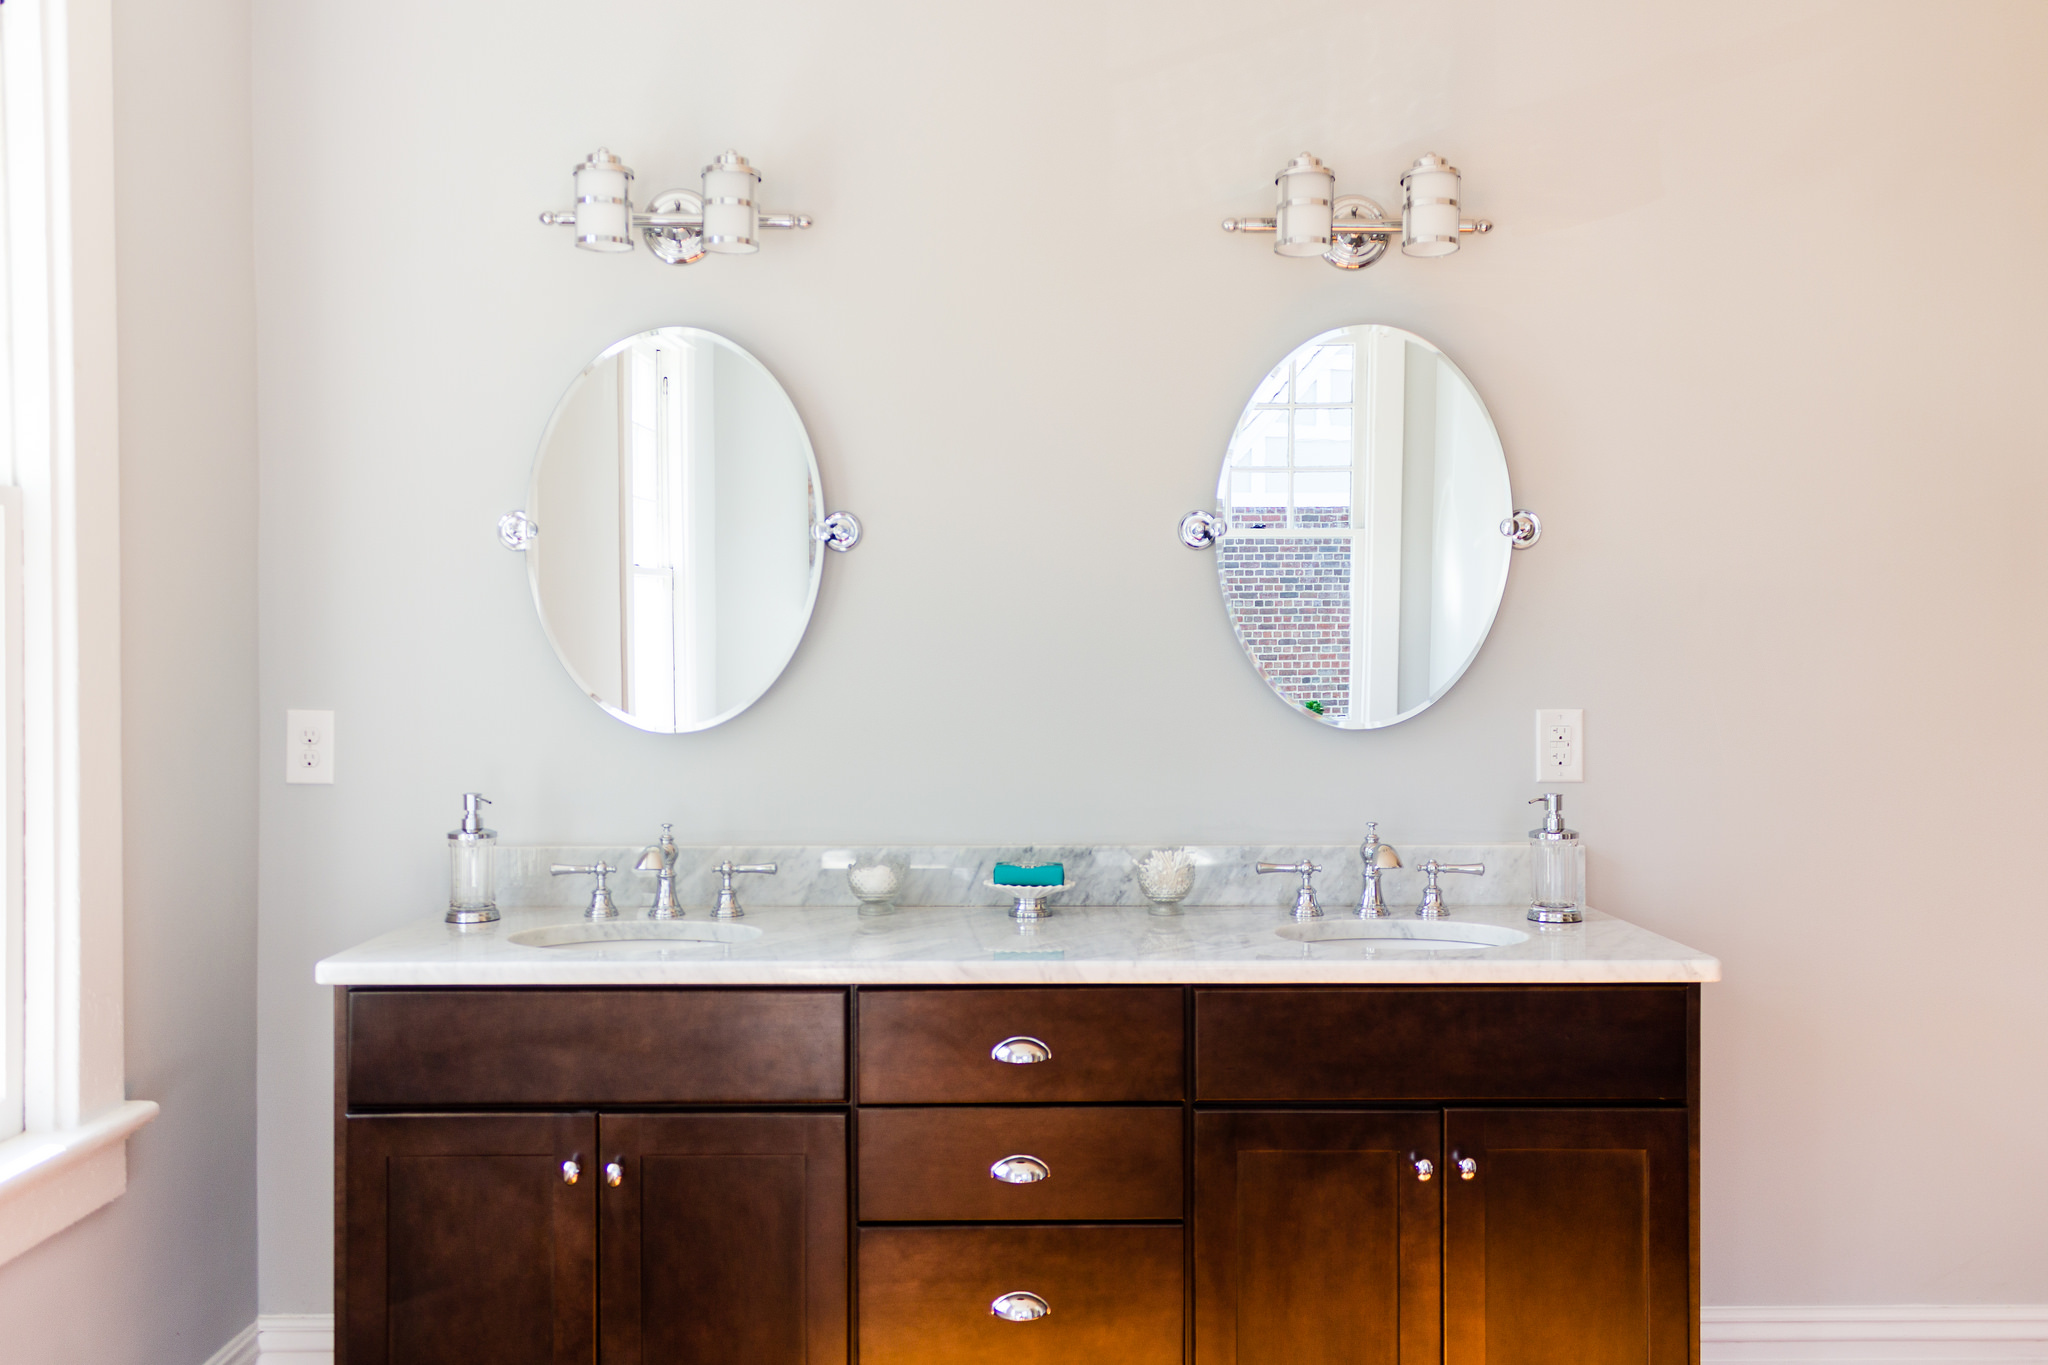 Bathroom Mirror Inspiration remodelaholic | spacious bathroom inspiration